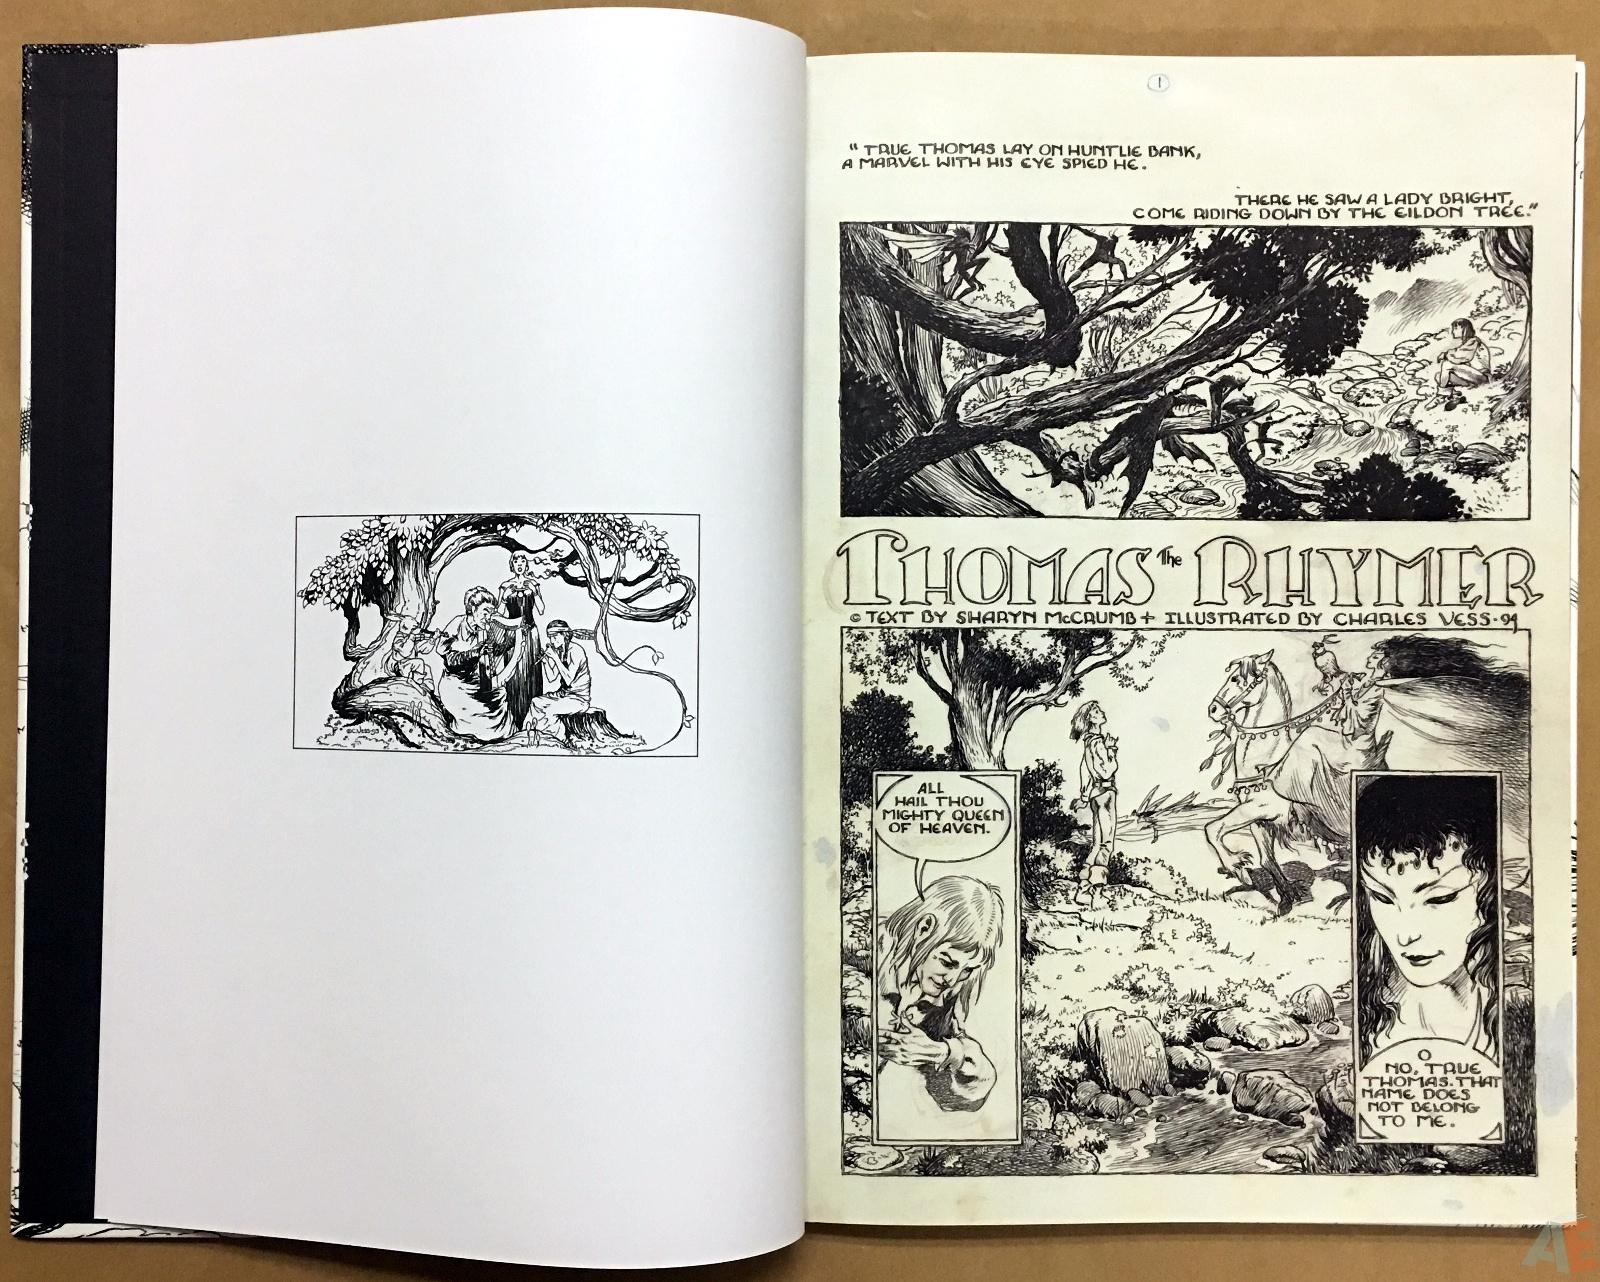 The Book Of Ballads, The Original Art Edition 8